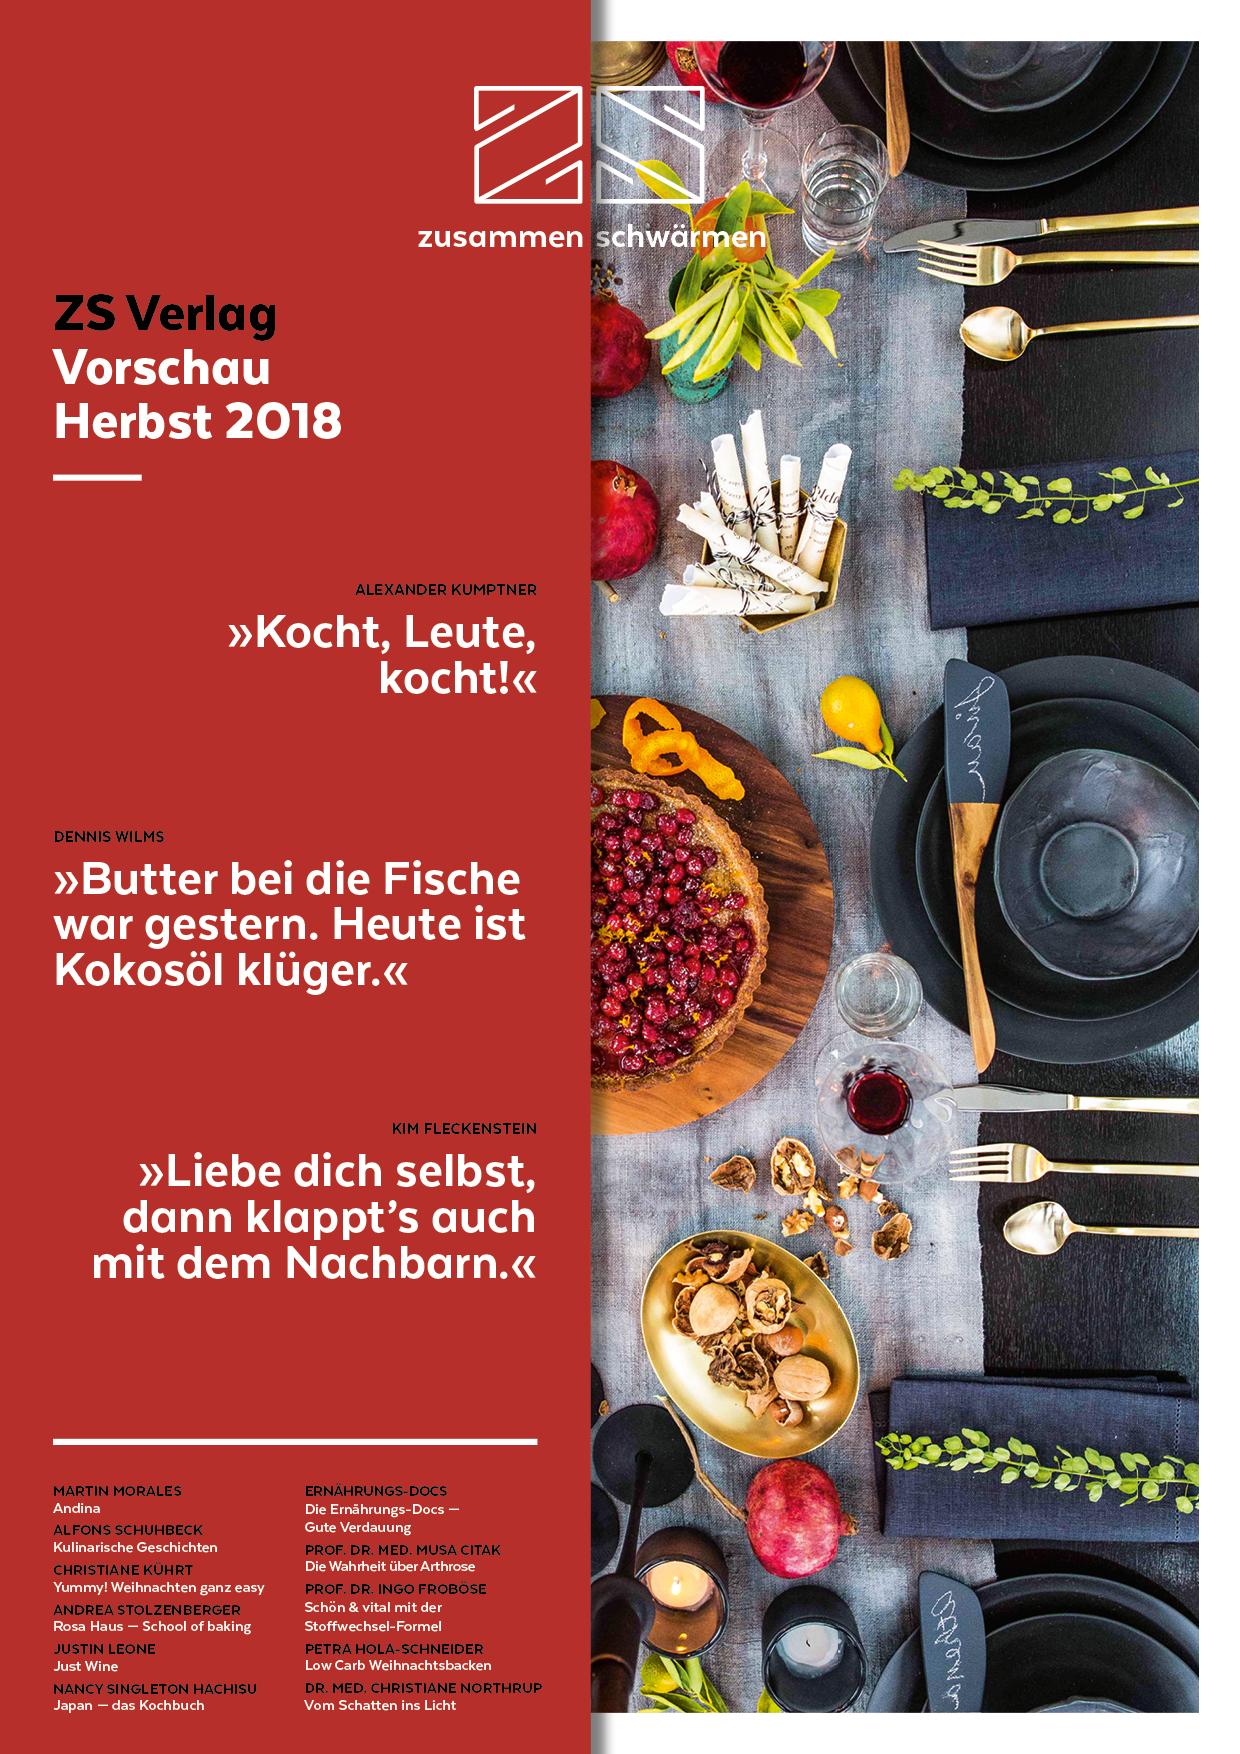 ZS Verlag Herbst 2018